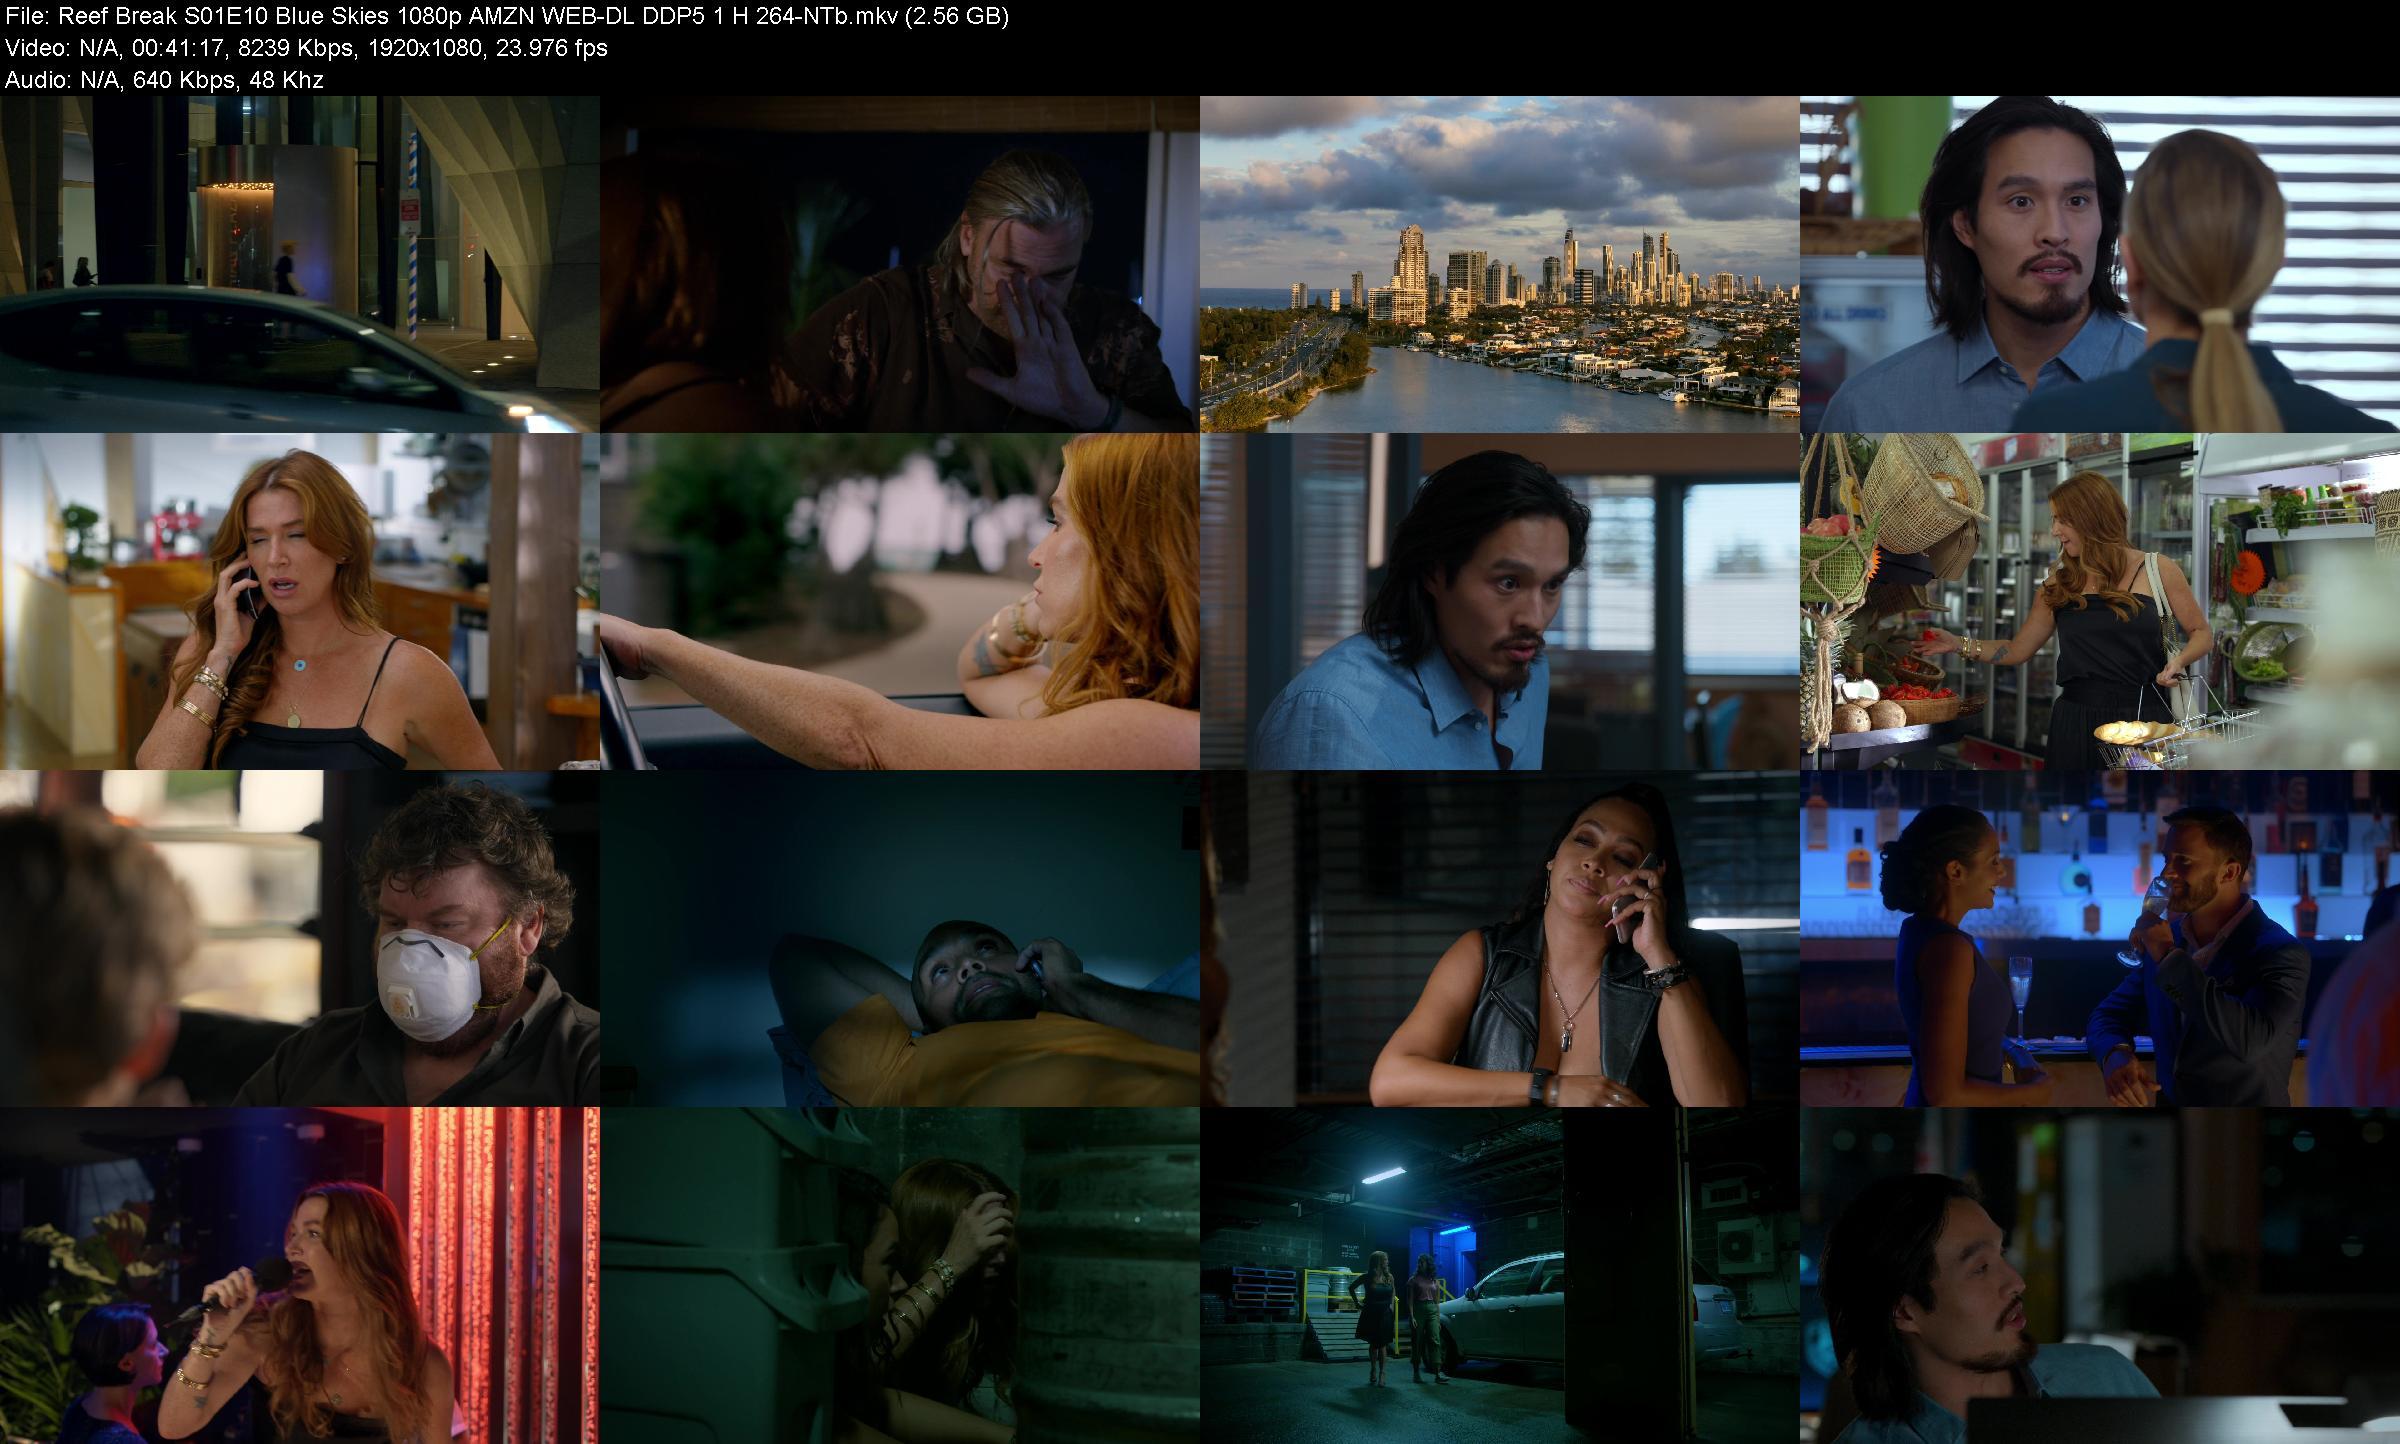 Reef Break S01E10 Blue Skies 1080p AMZN WEB-DL DDP5 1 H 264-NTb